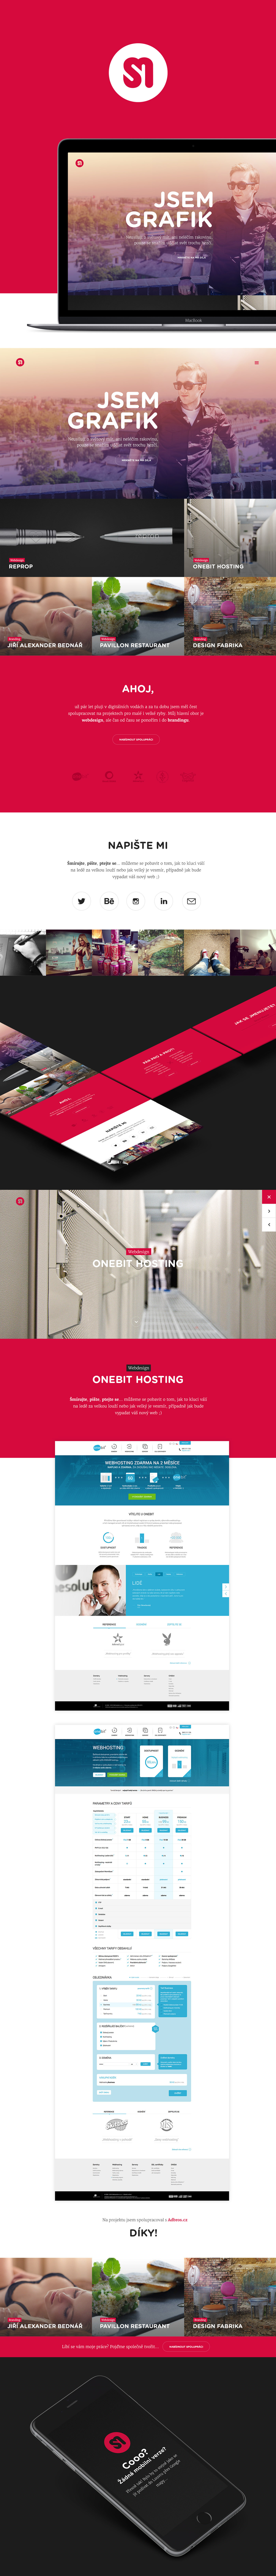 portfolio personal Work  gallery design Web Webdesign